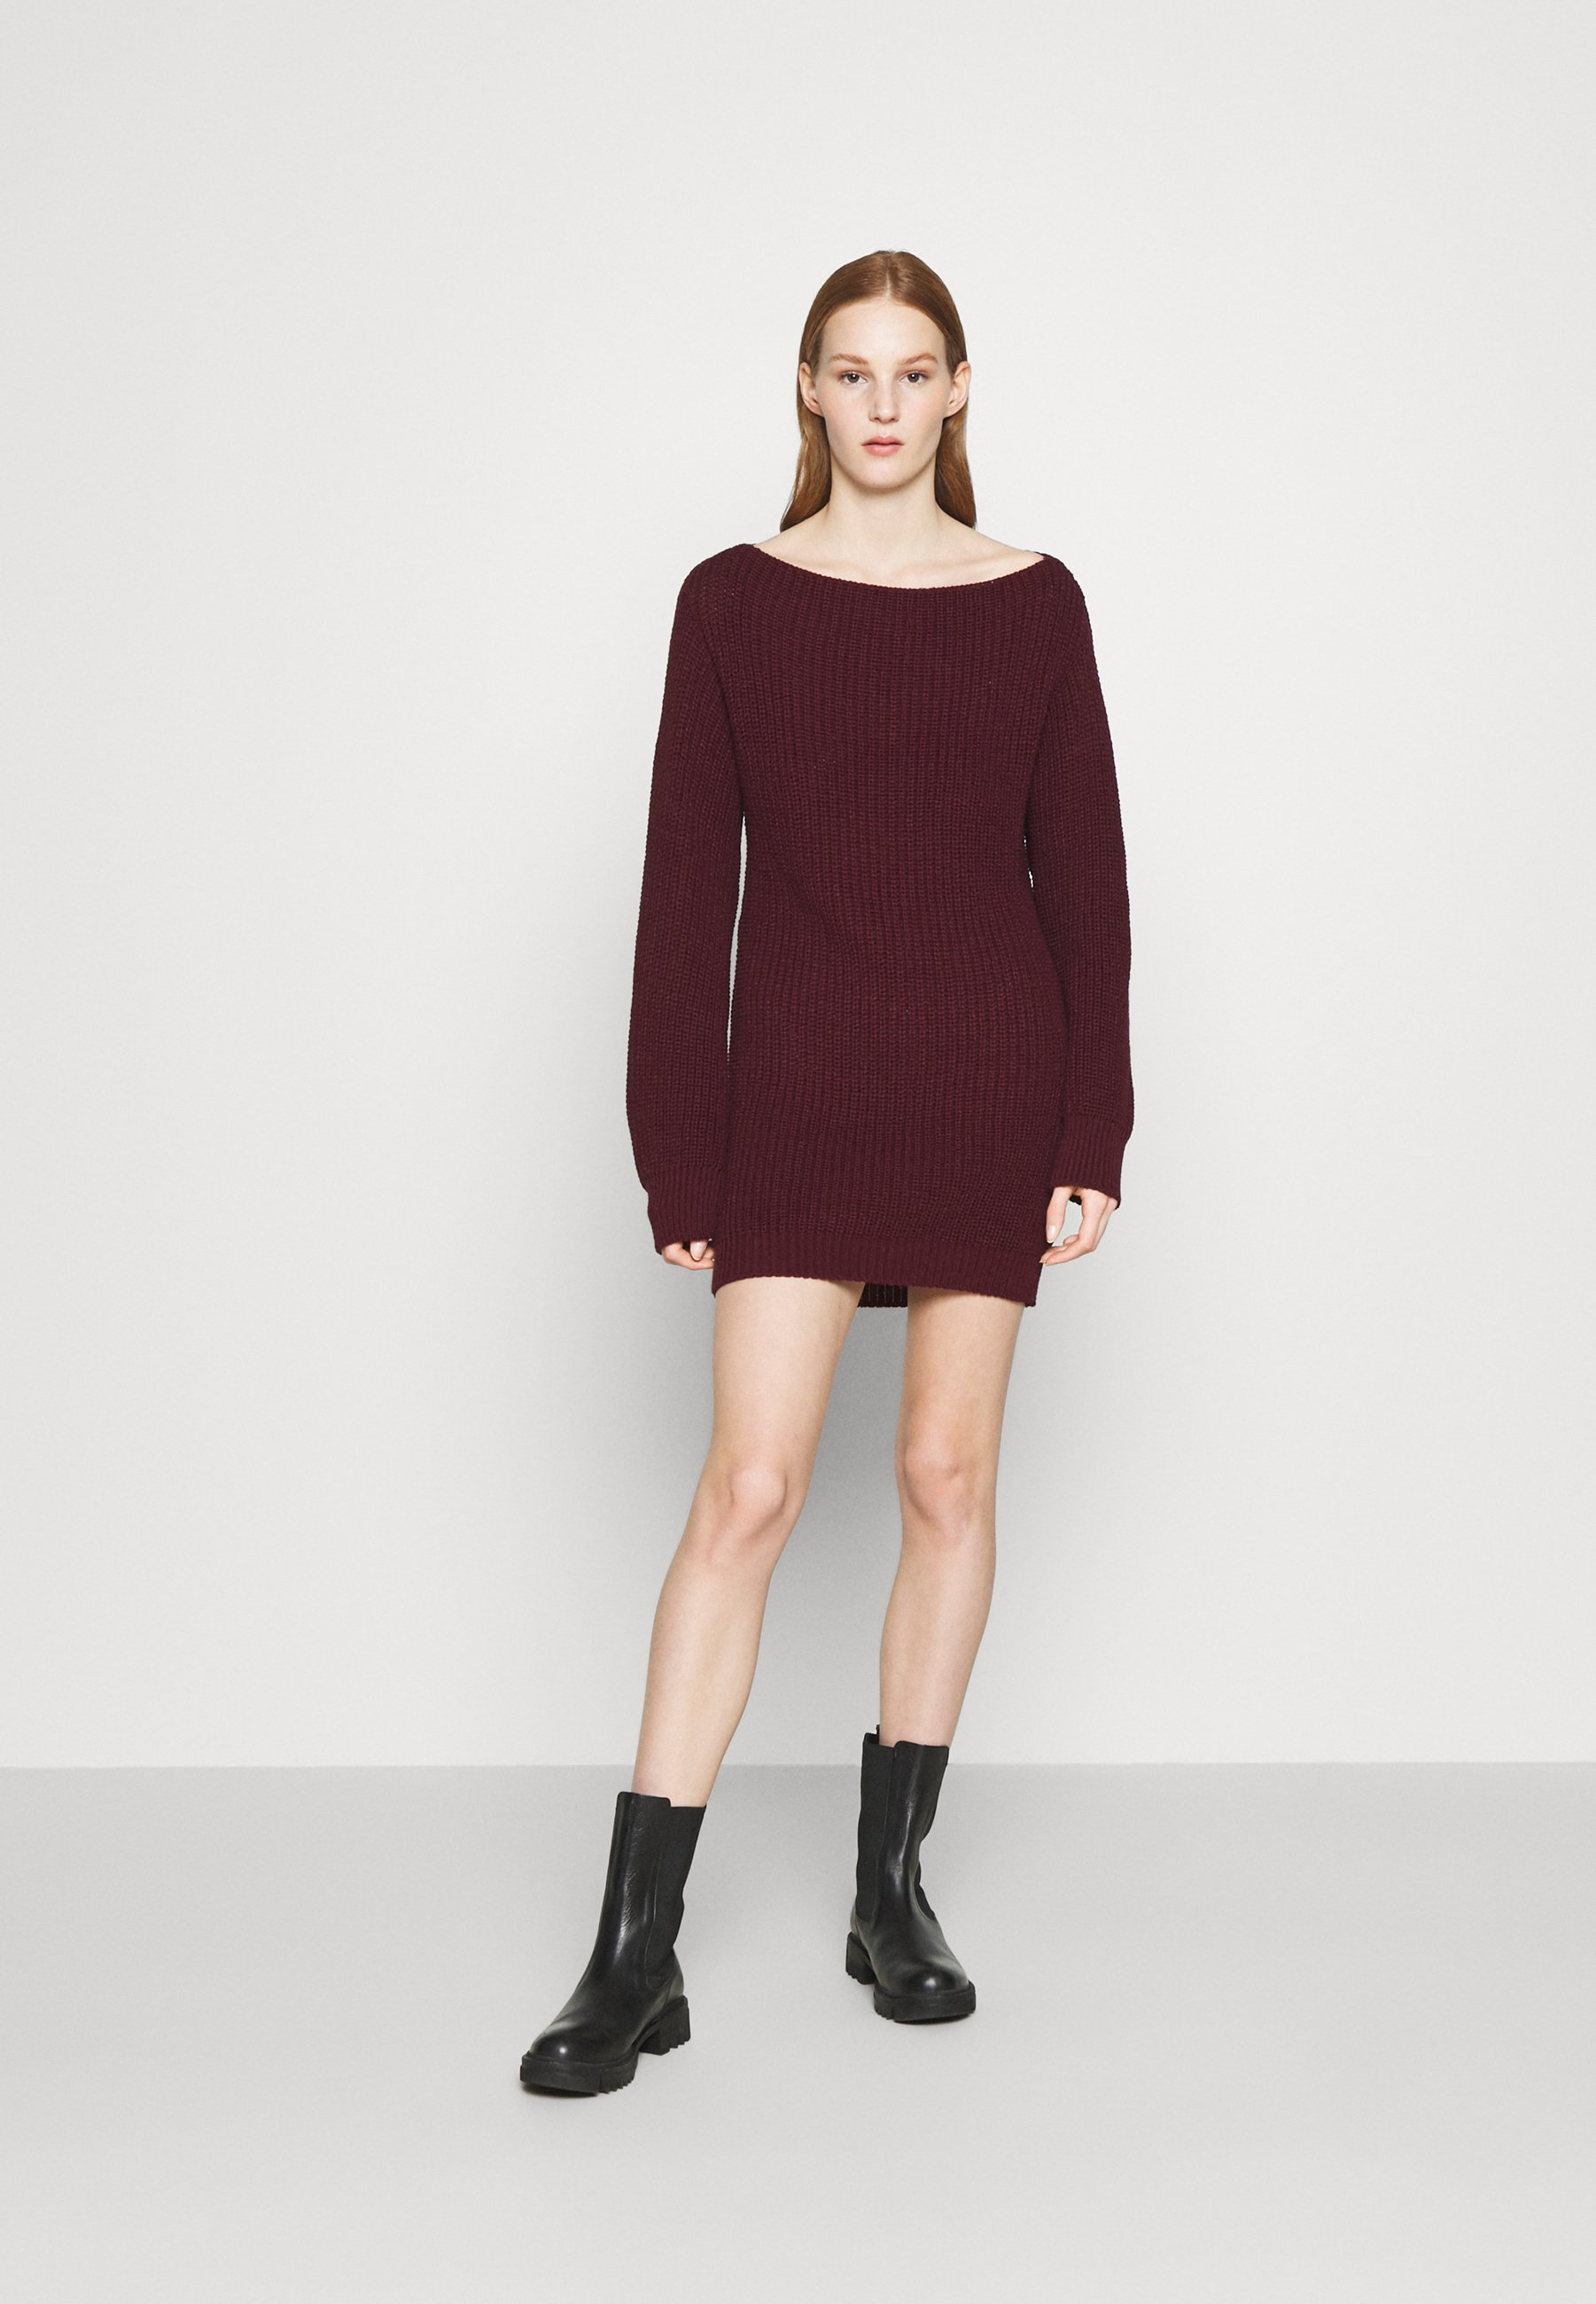 Femme MINI DRESS - Robe pull